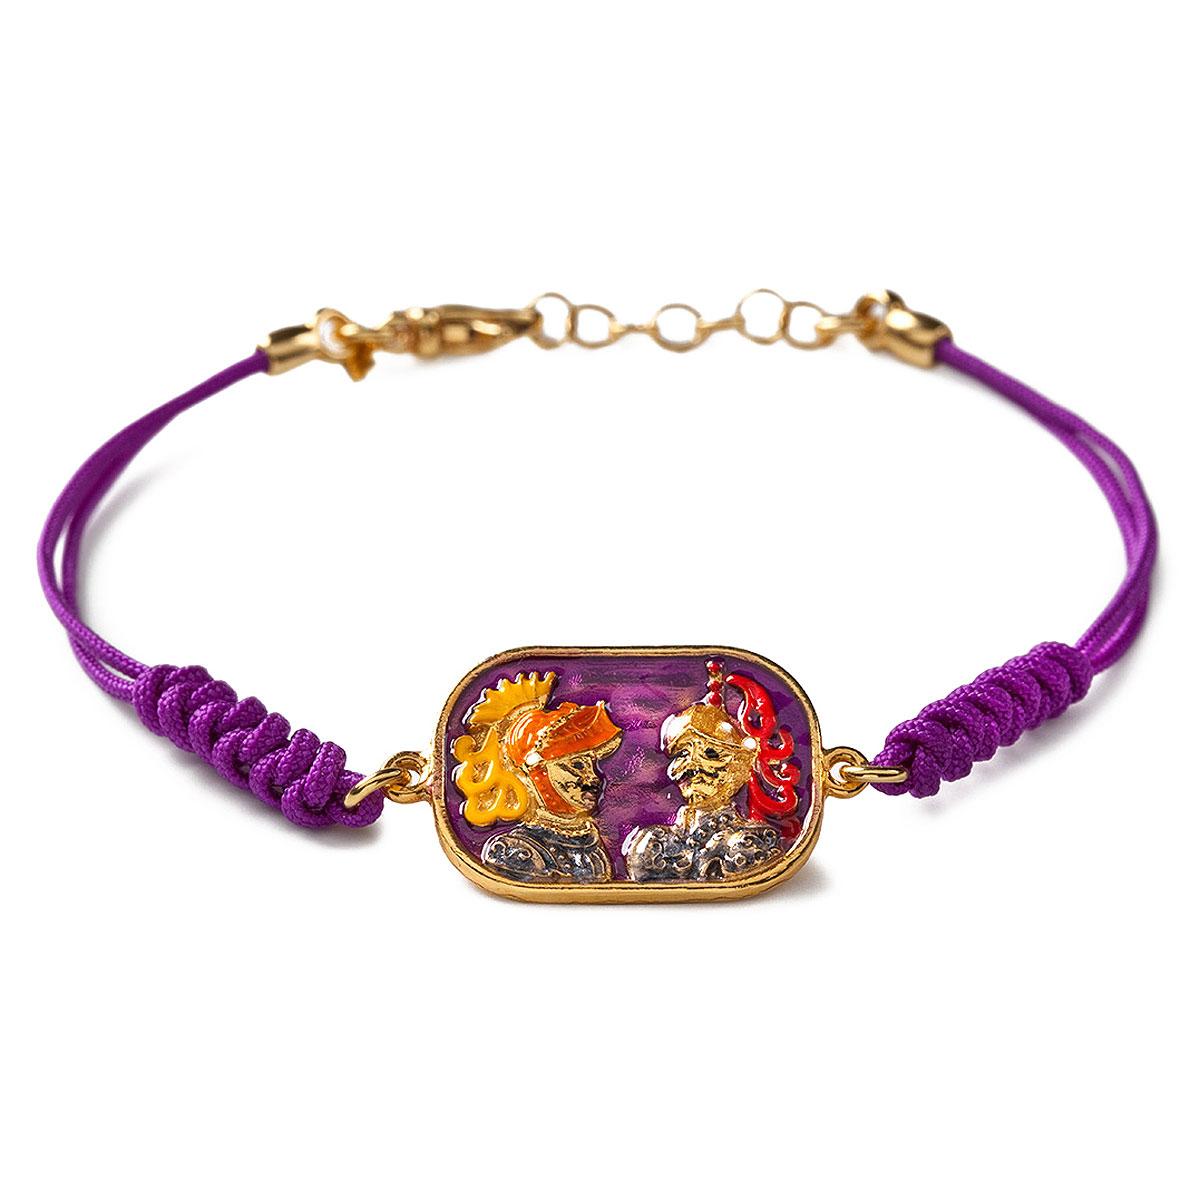 Image of Isola Bella Bracelet for Women, Violet, Silver 925 Galvanized Gold, 2017